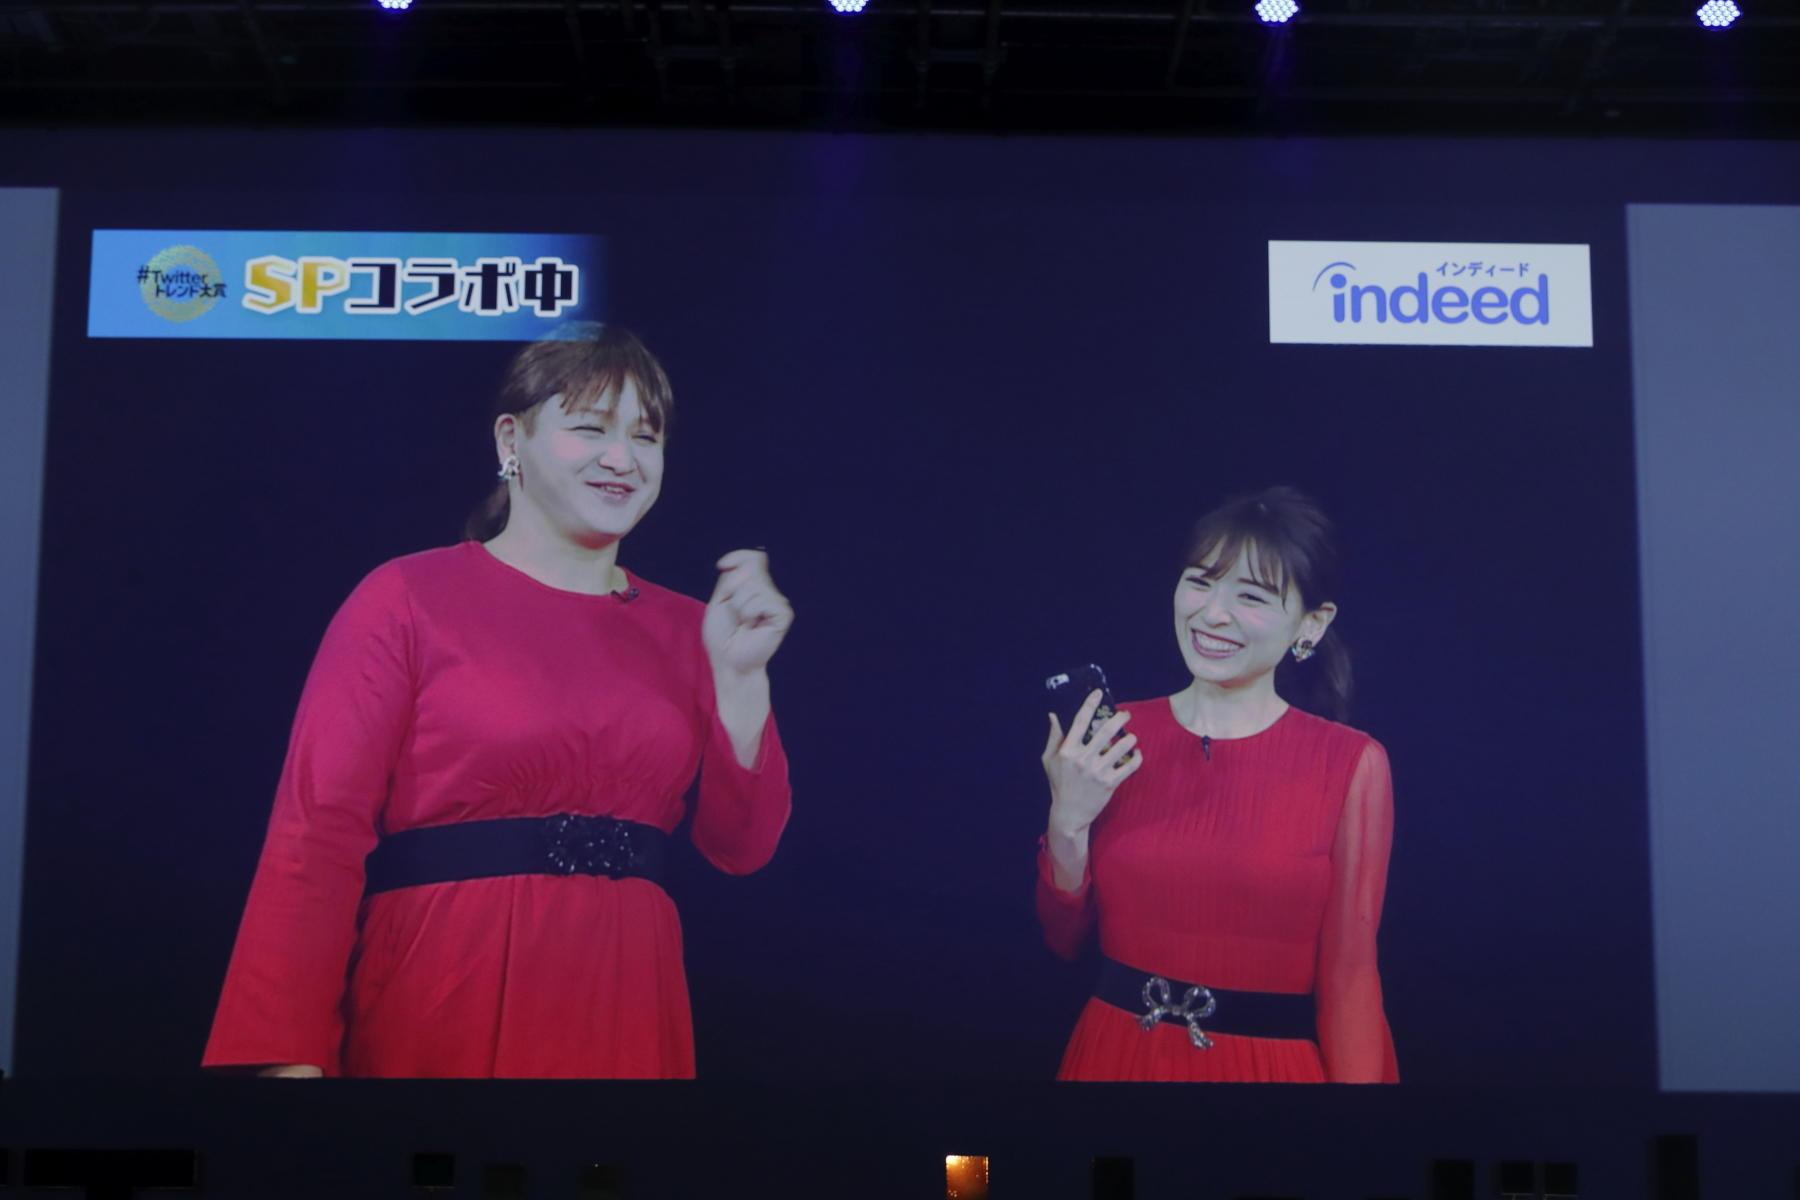 http://news.yoshimoto.co.jp/20190122013526-9ccbc69a1437a4d41f8192ae0c0b67eba10c311e.jpg